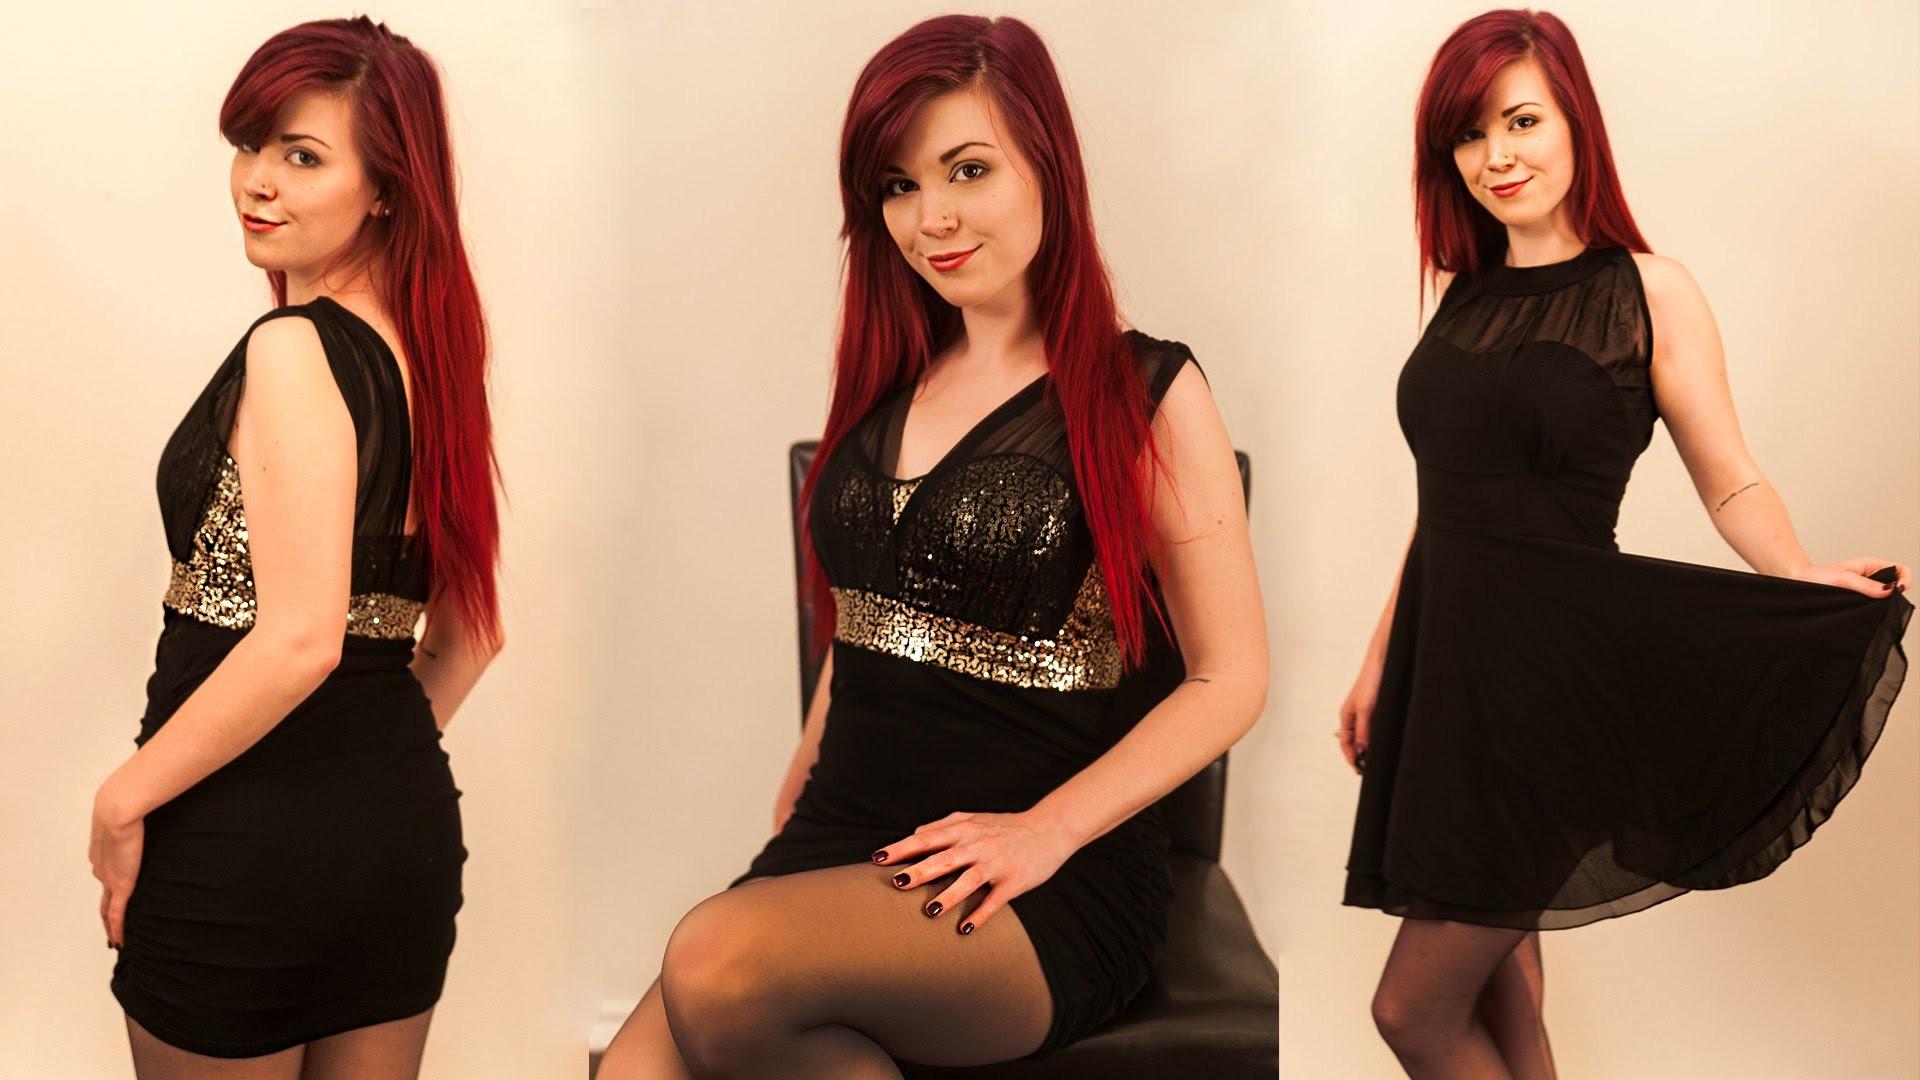 ASMR Dress Up Fashion Show Haul 2 Cheap Dresses by NewDress Whisper Ear to Ear Binaural